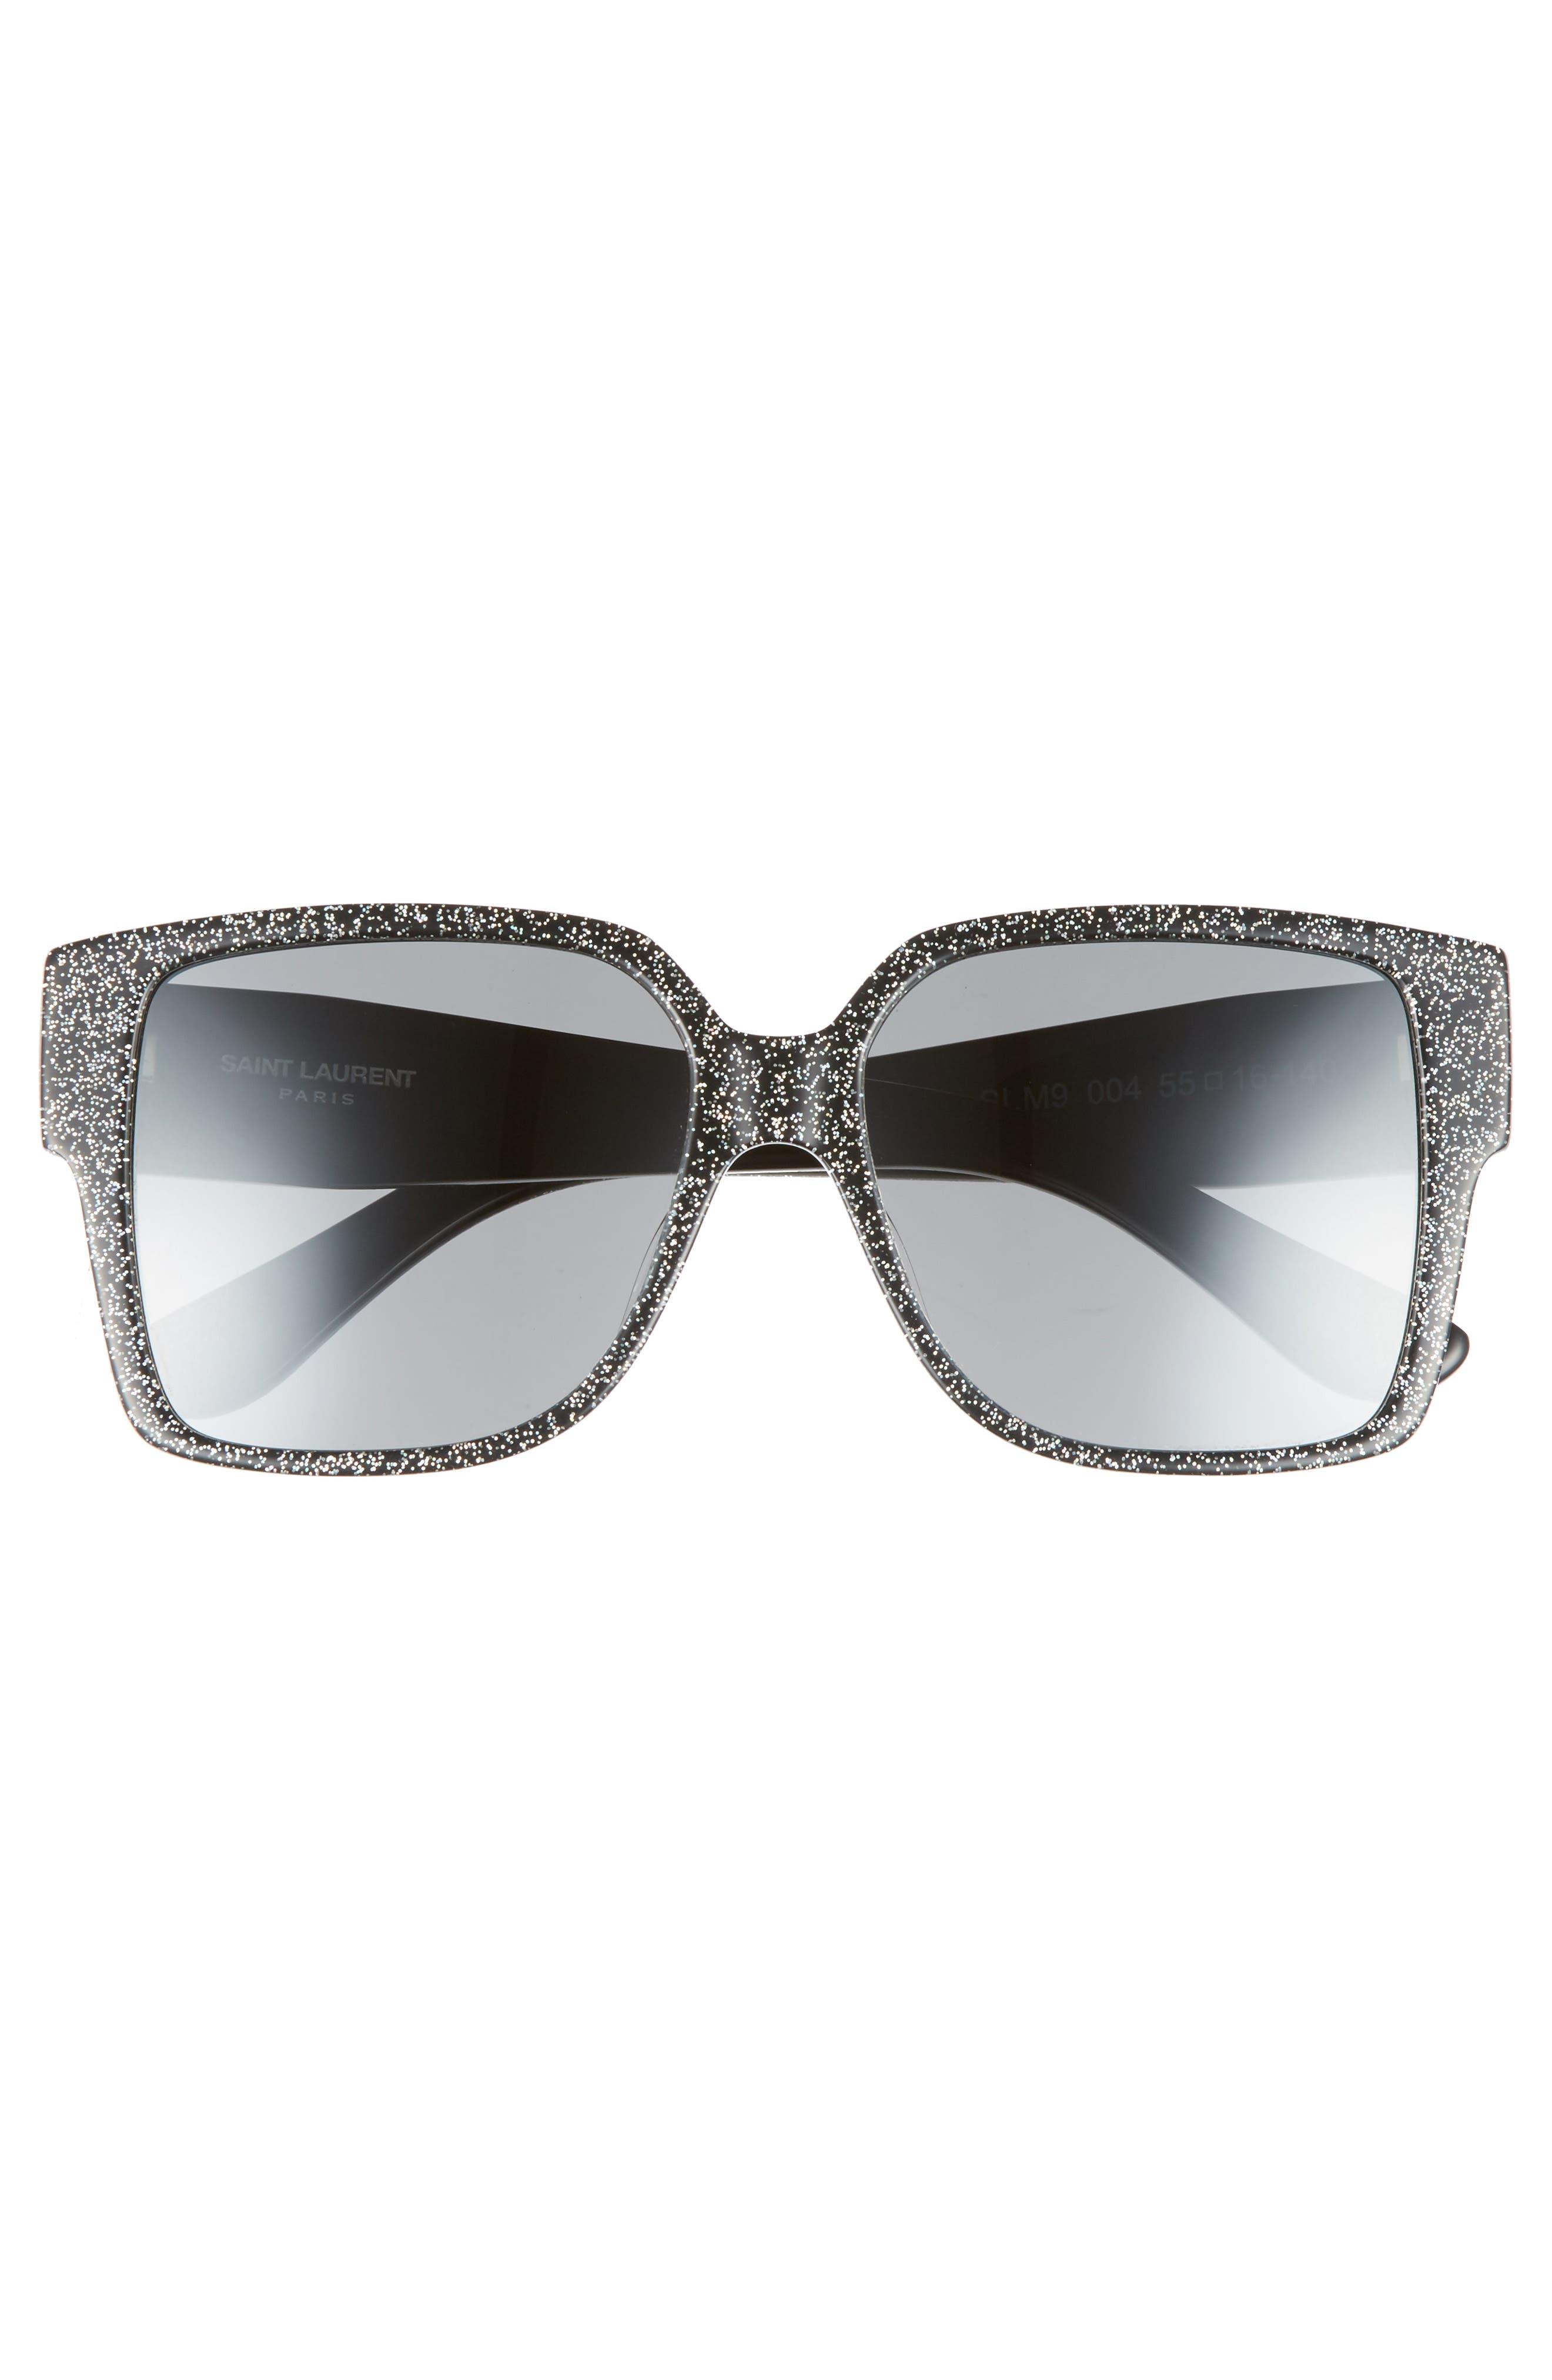 SAINT LAURENT, 55mm Square Sunglasses, Alternate thumbnail 3, color, MULTI/ SILVER